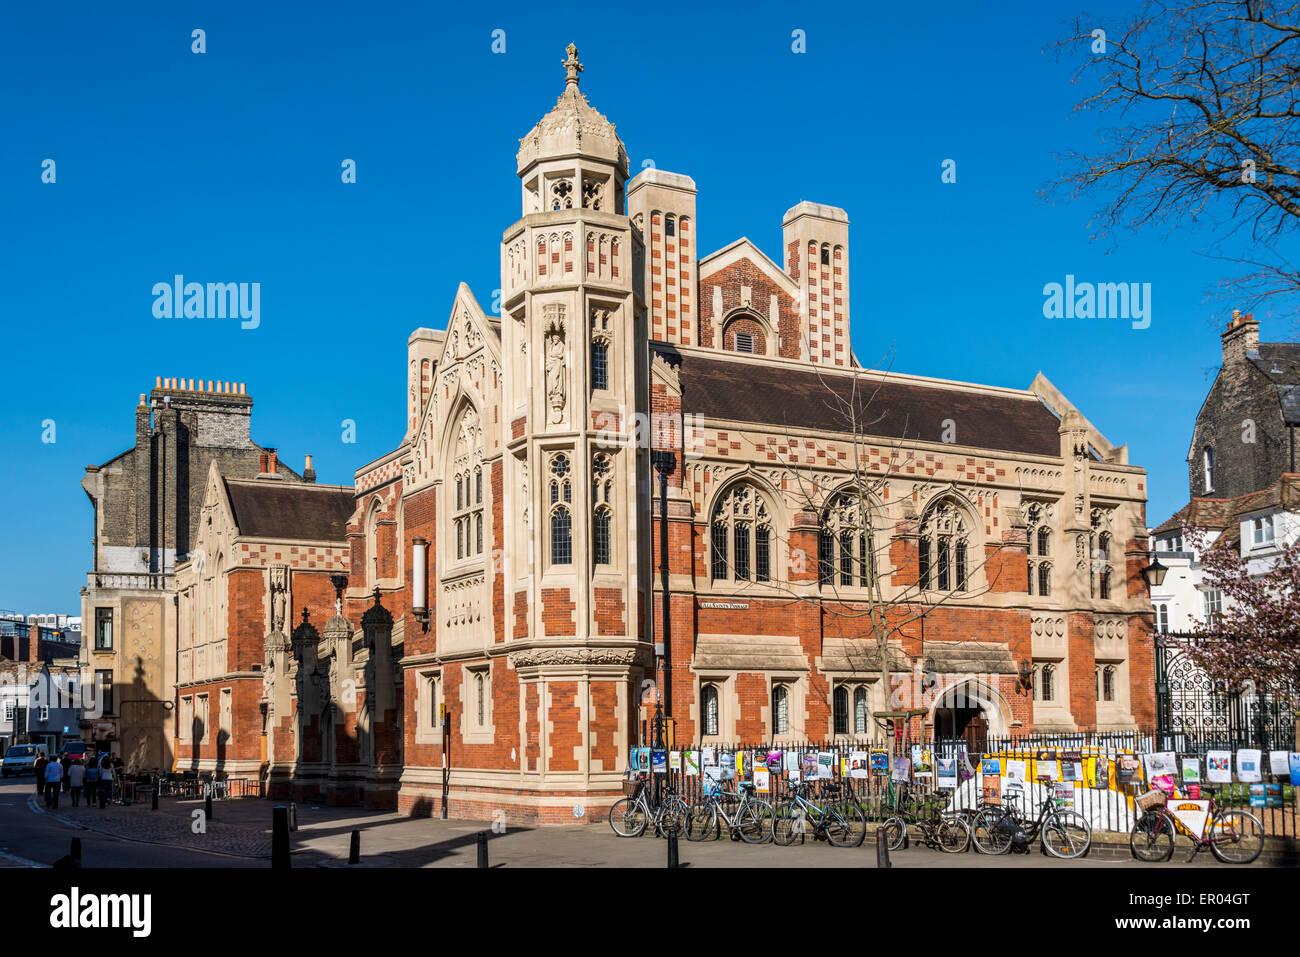 St John's College Cambridge is a college of Cambridge University - Stock Image